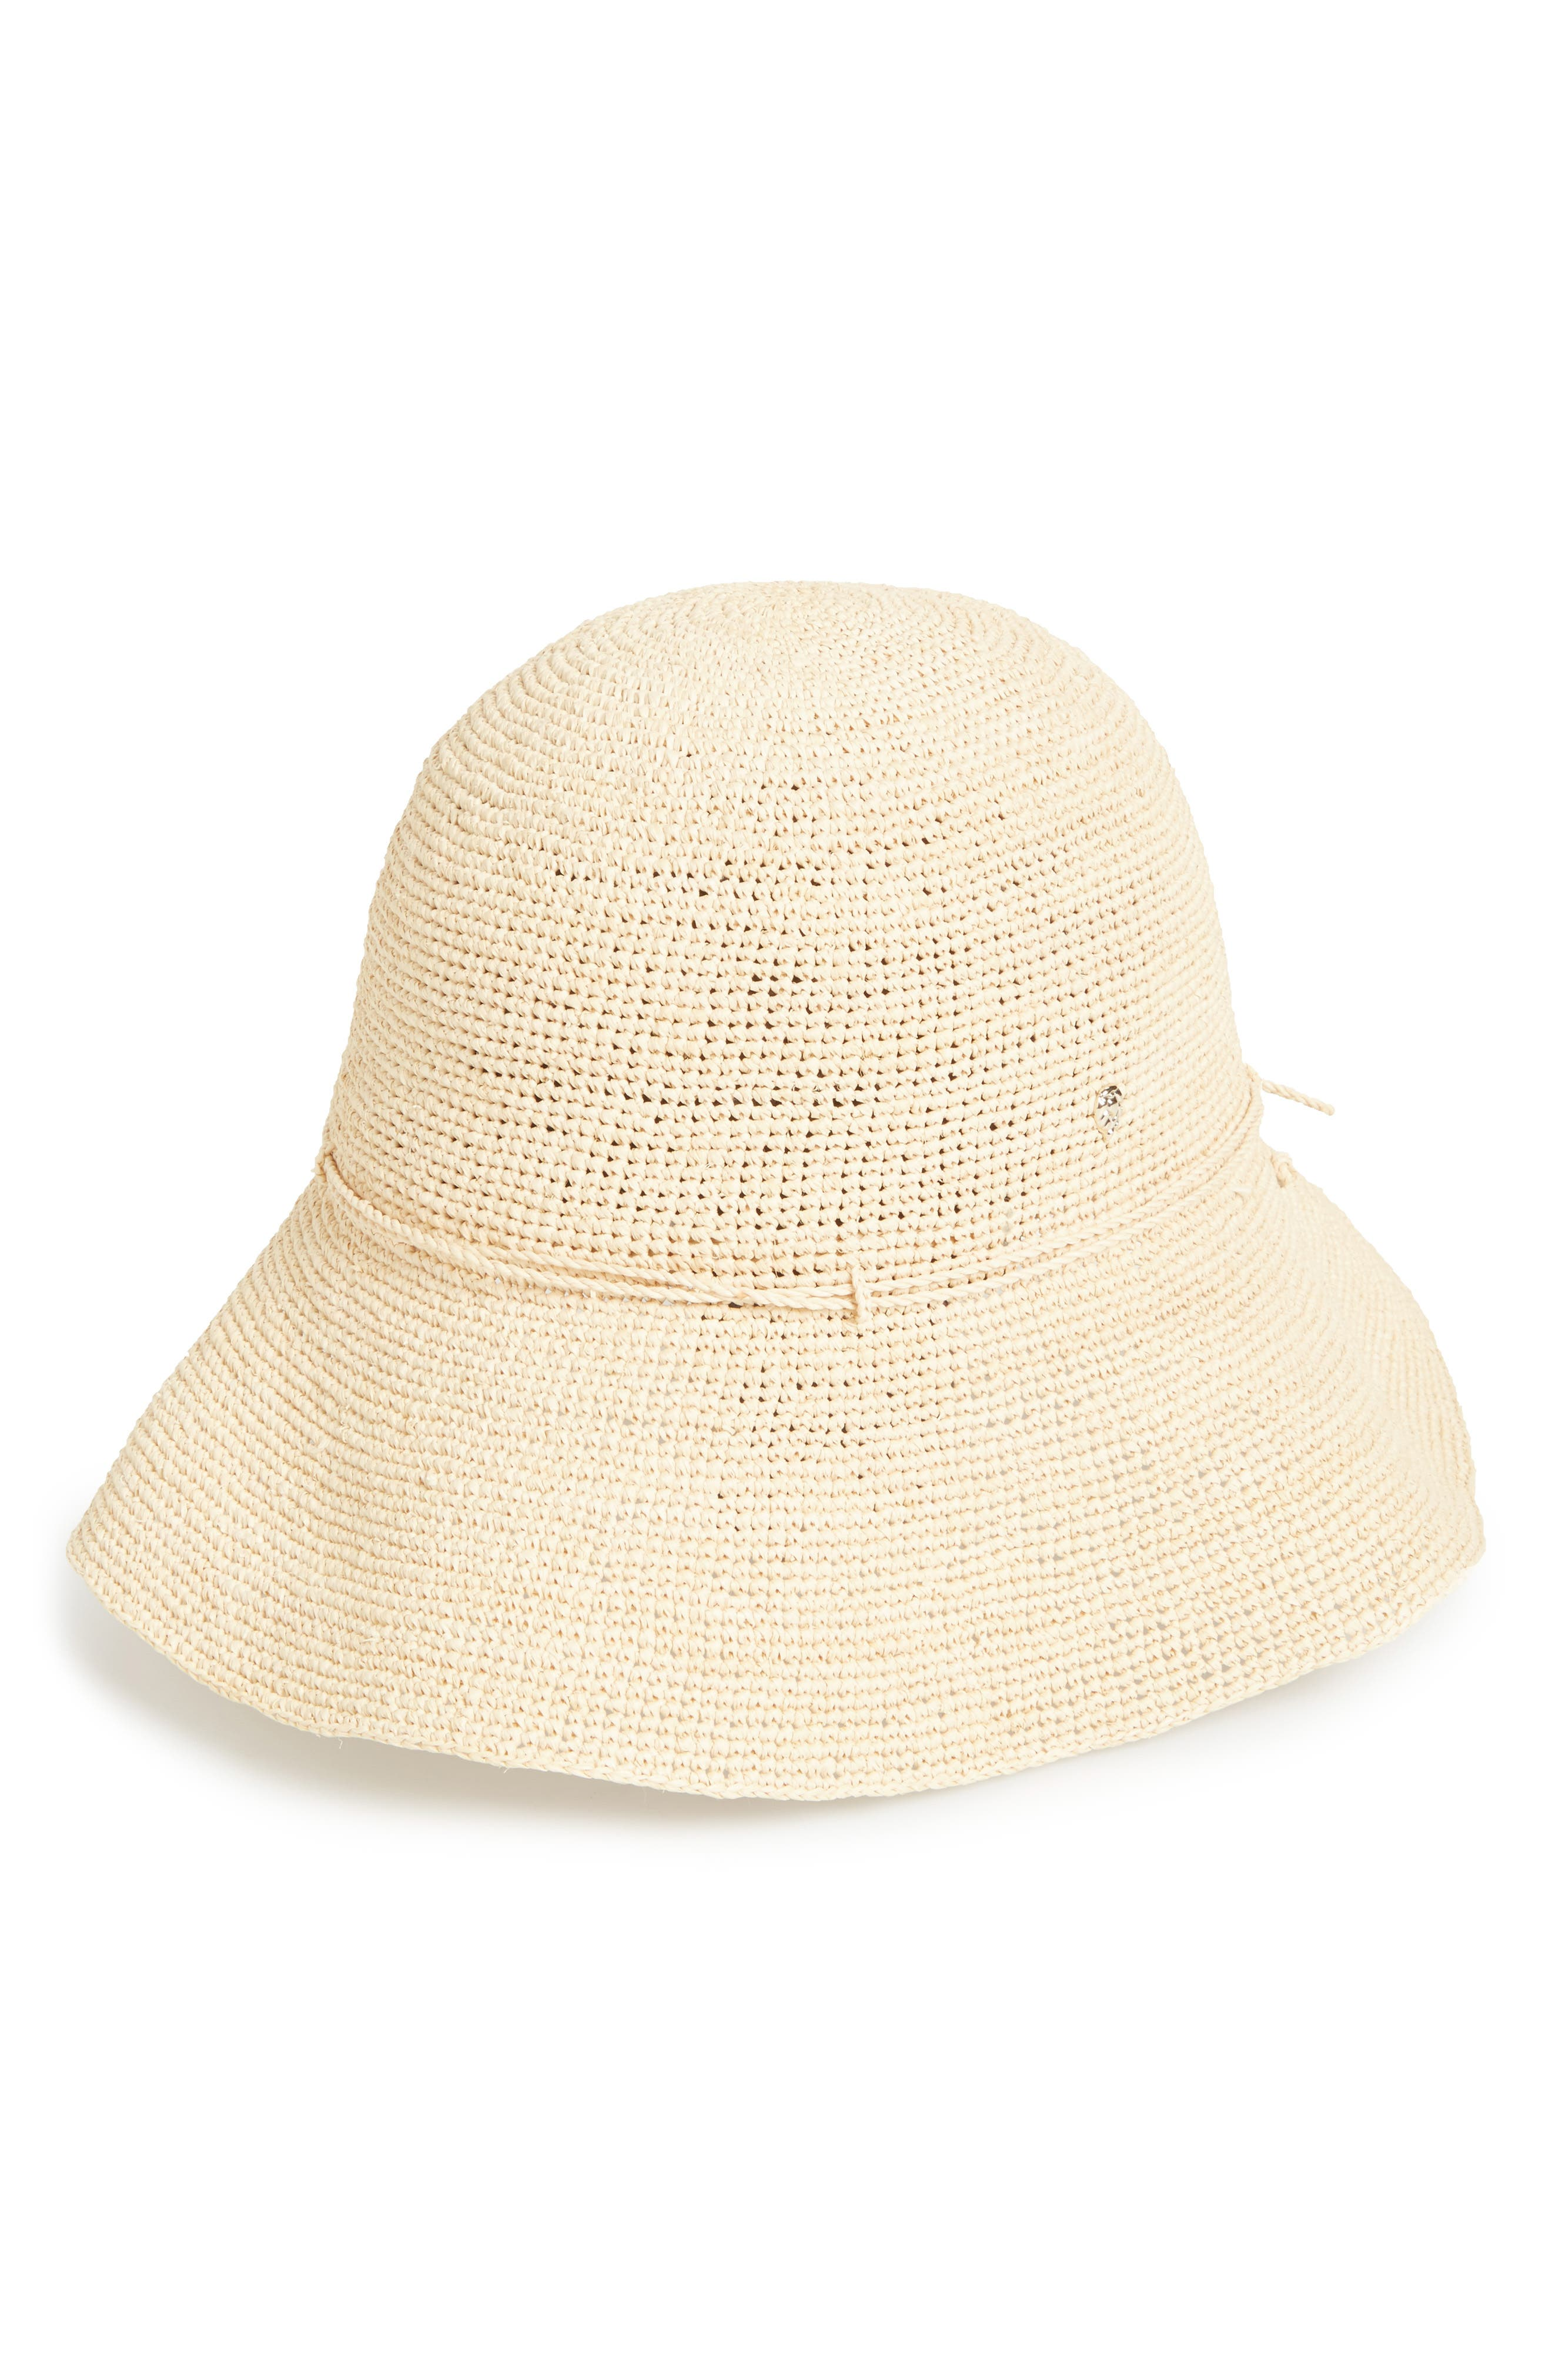 Alternate Image 1 Selected - Helen Kaminski '9 Villa' Raffia Straw Hat